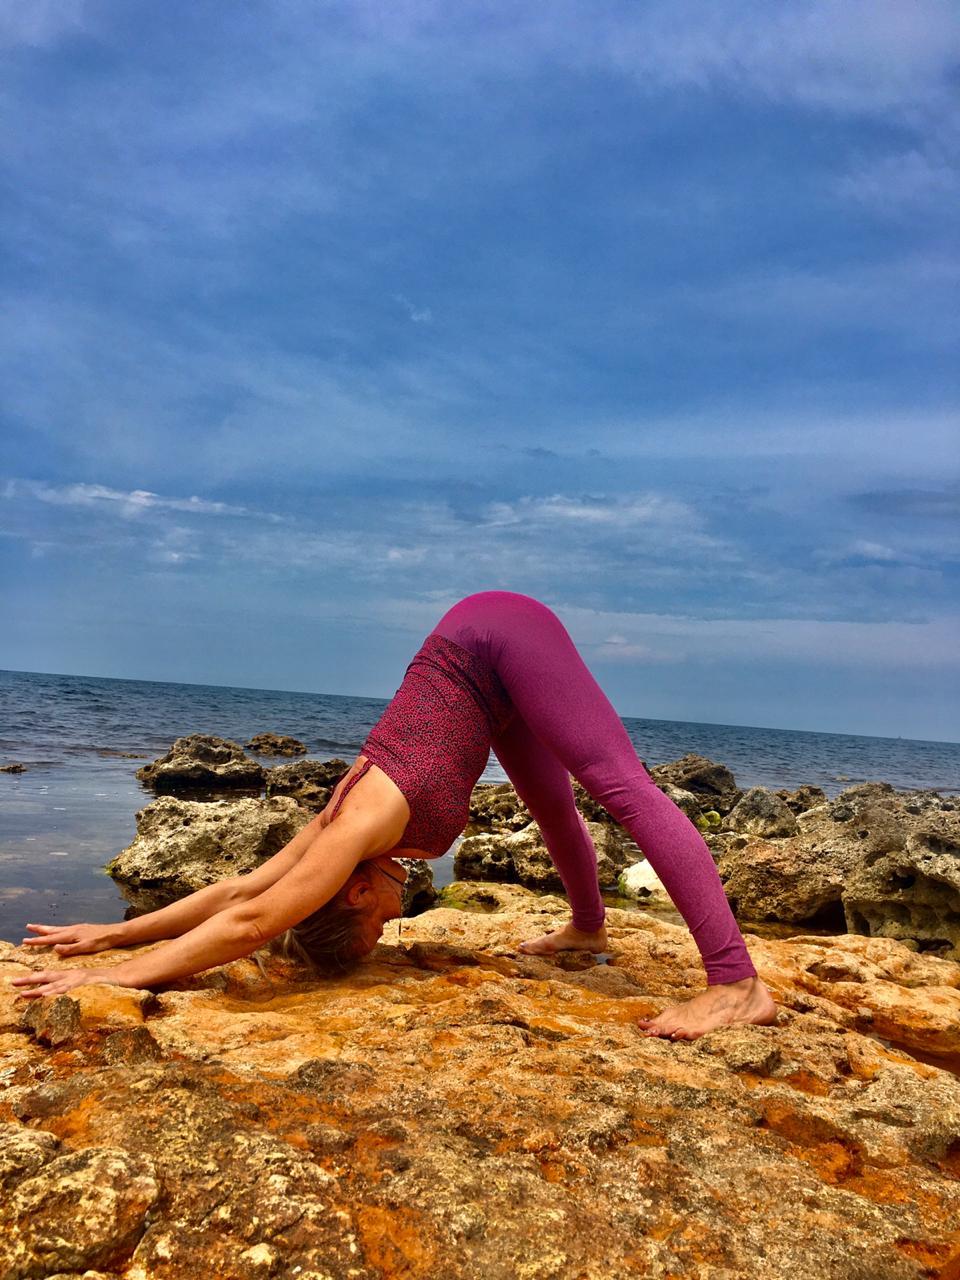 Йога при тревоге и панических атаках – с 3 асанами